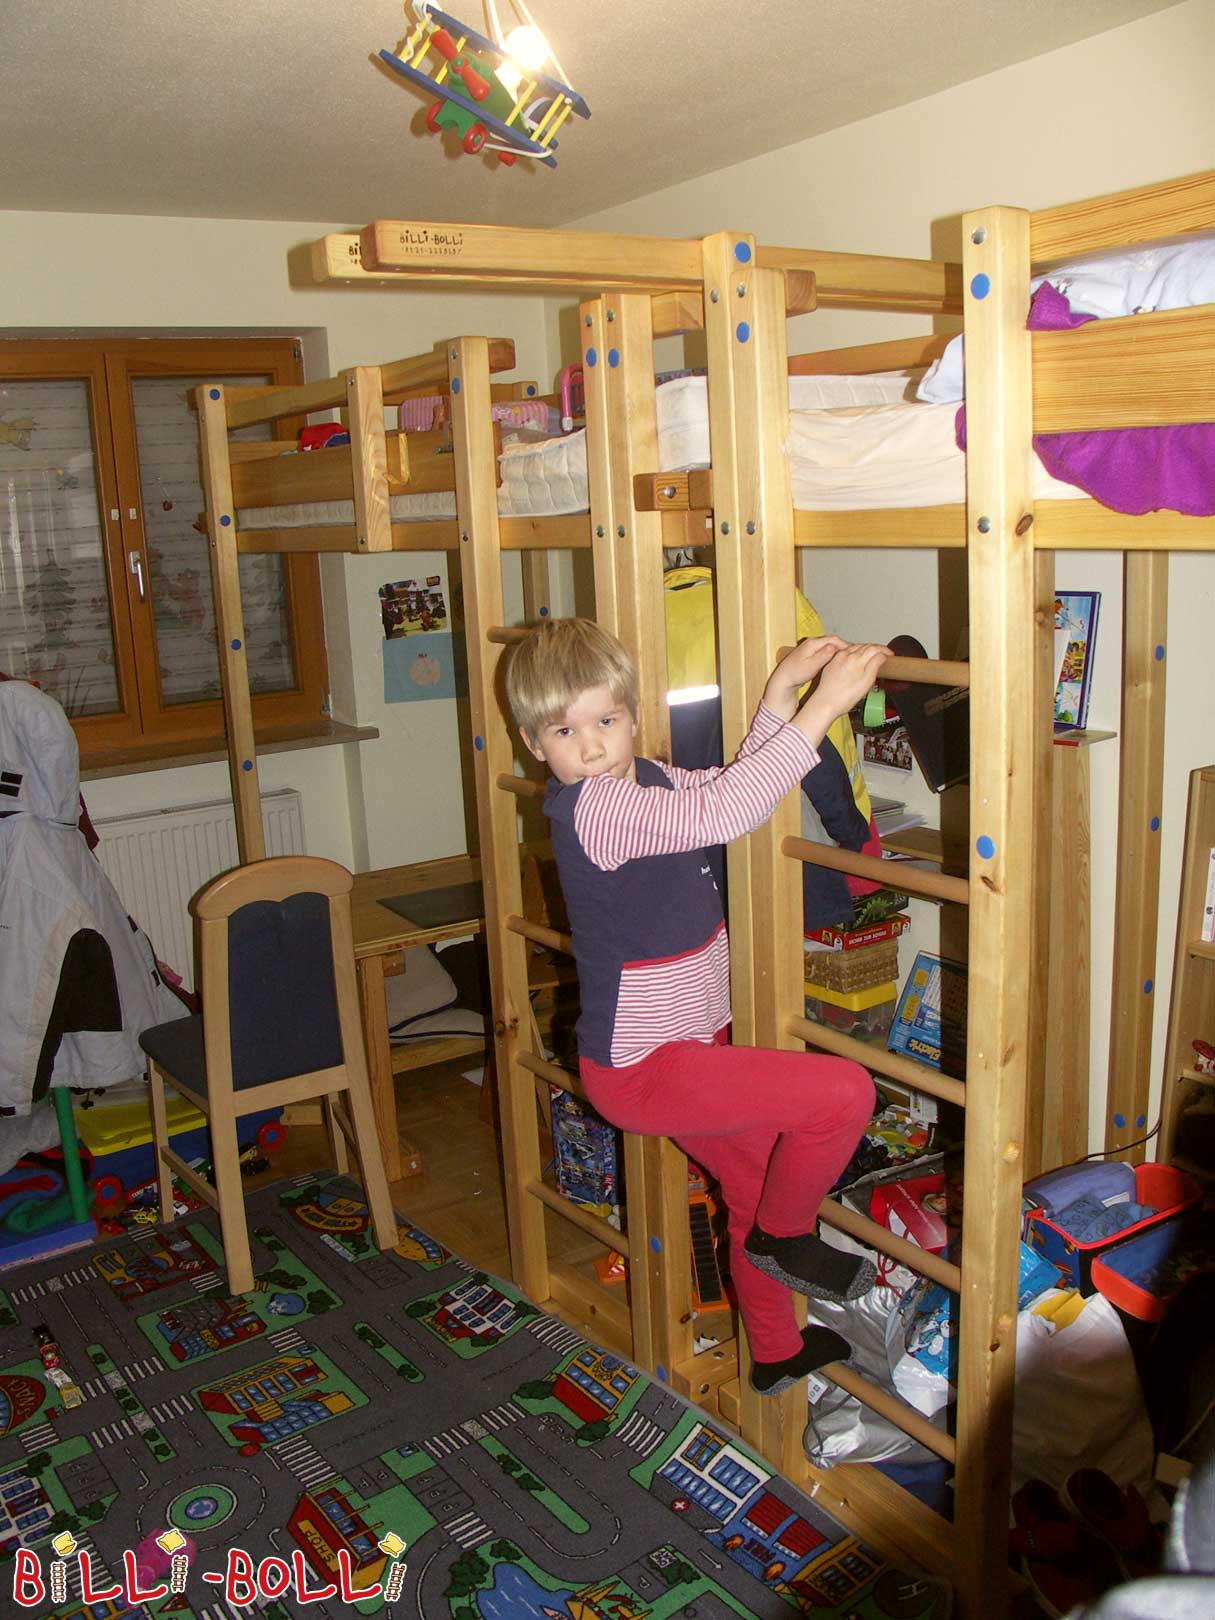 Cama Alta Para Adolescentes Muebles Infantiles De Billi Bolli ~ Escaleras Infantiles Para Camas Altas